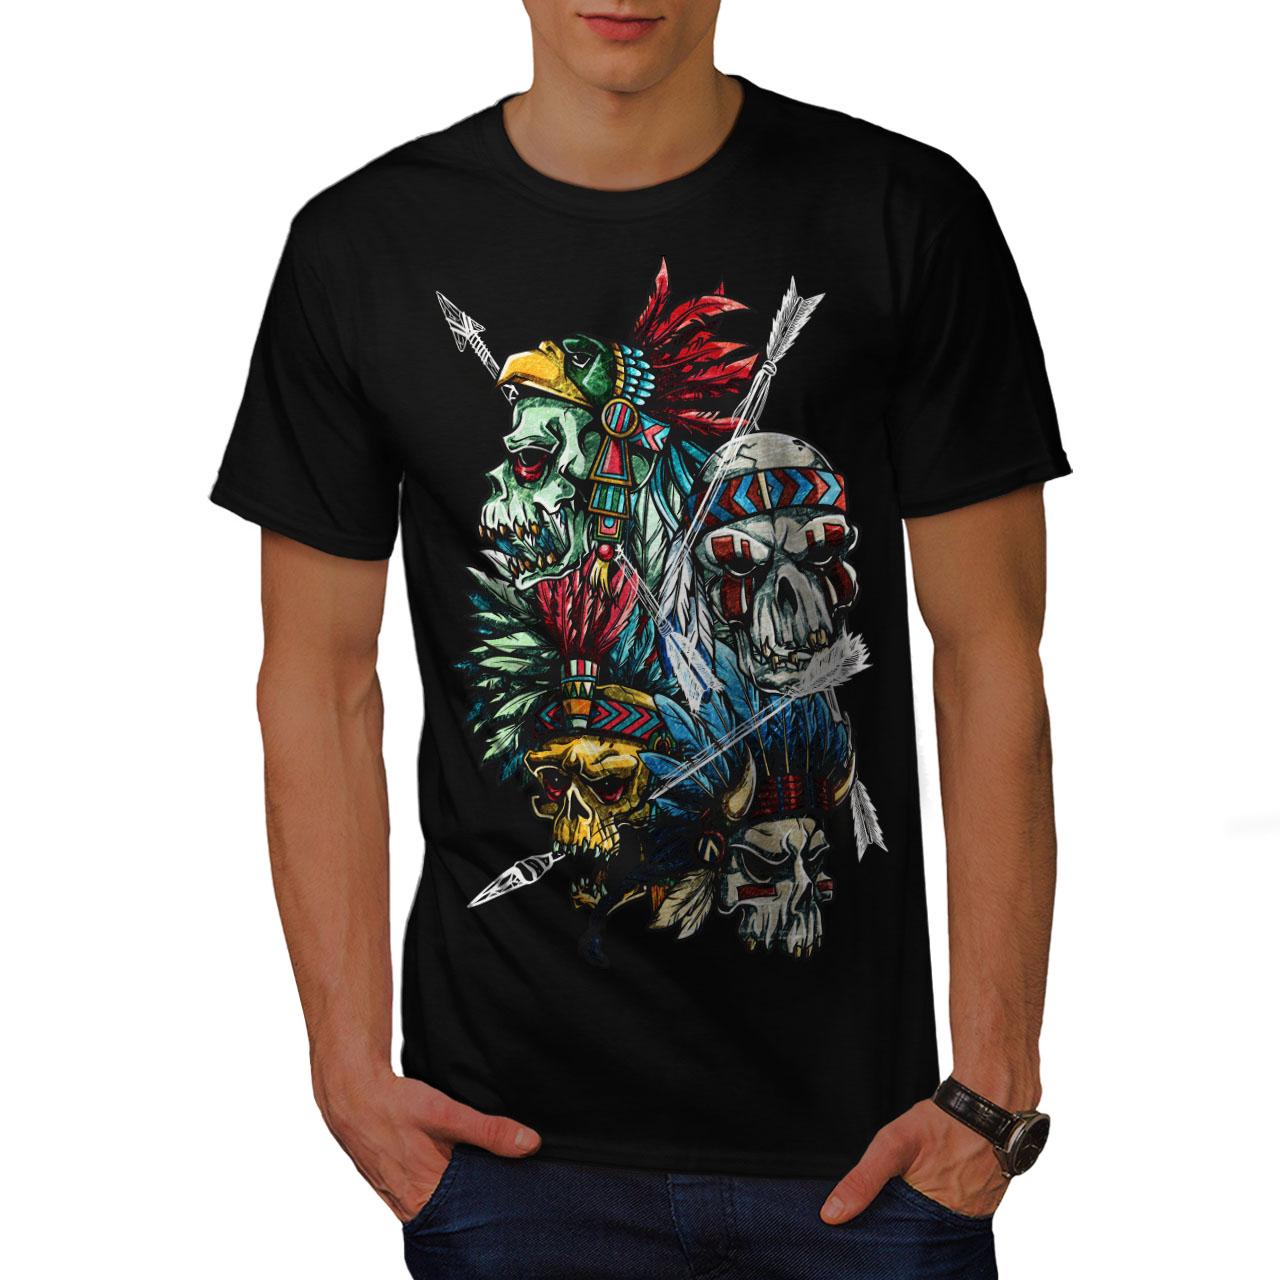 T484 I Love Heart Gordon Ramsay t shirt tee t-shirt Picture Secret Santa